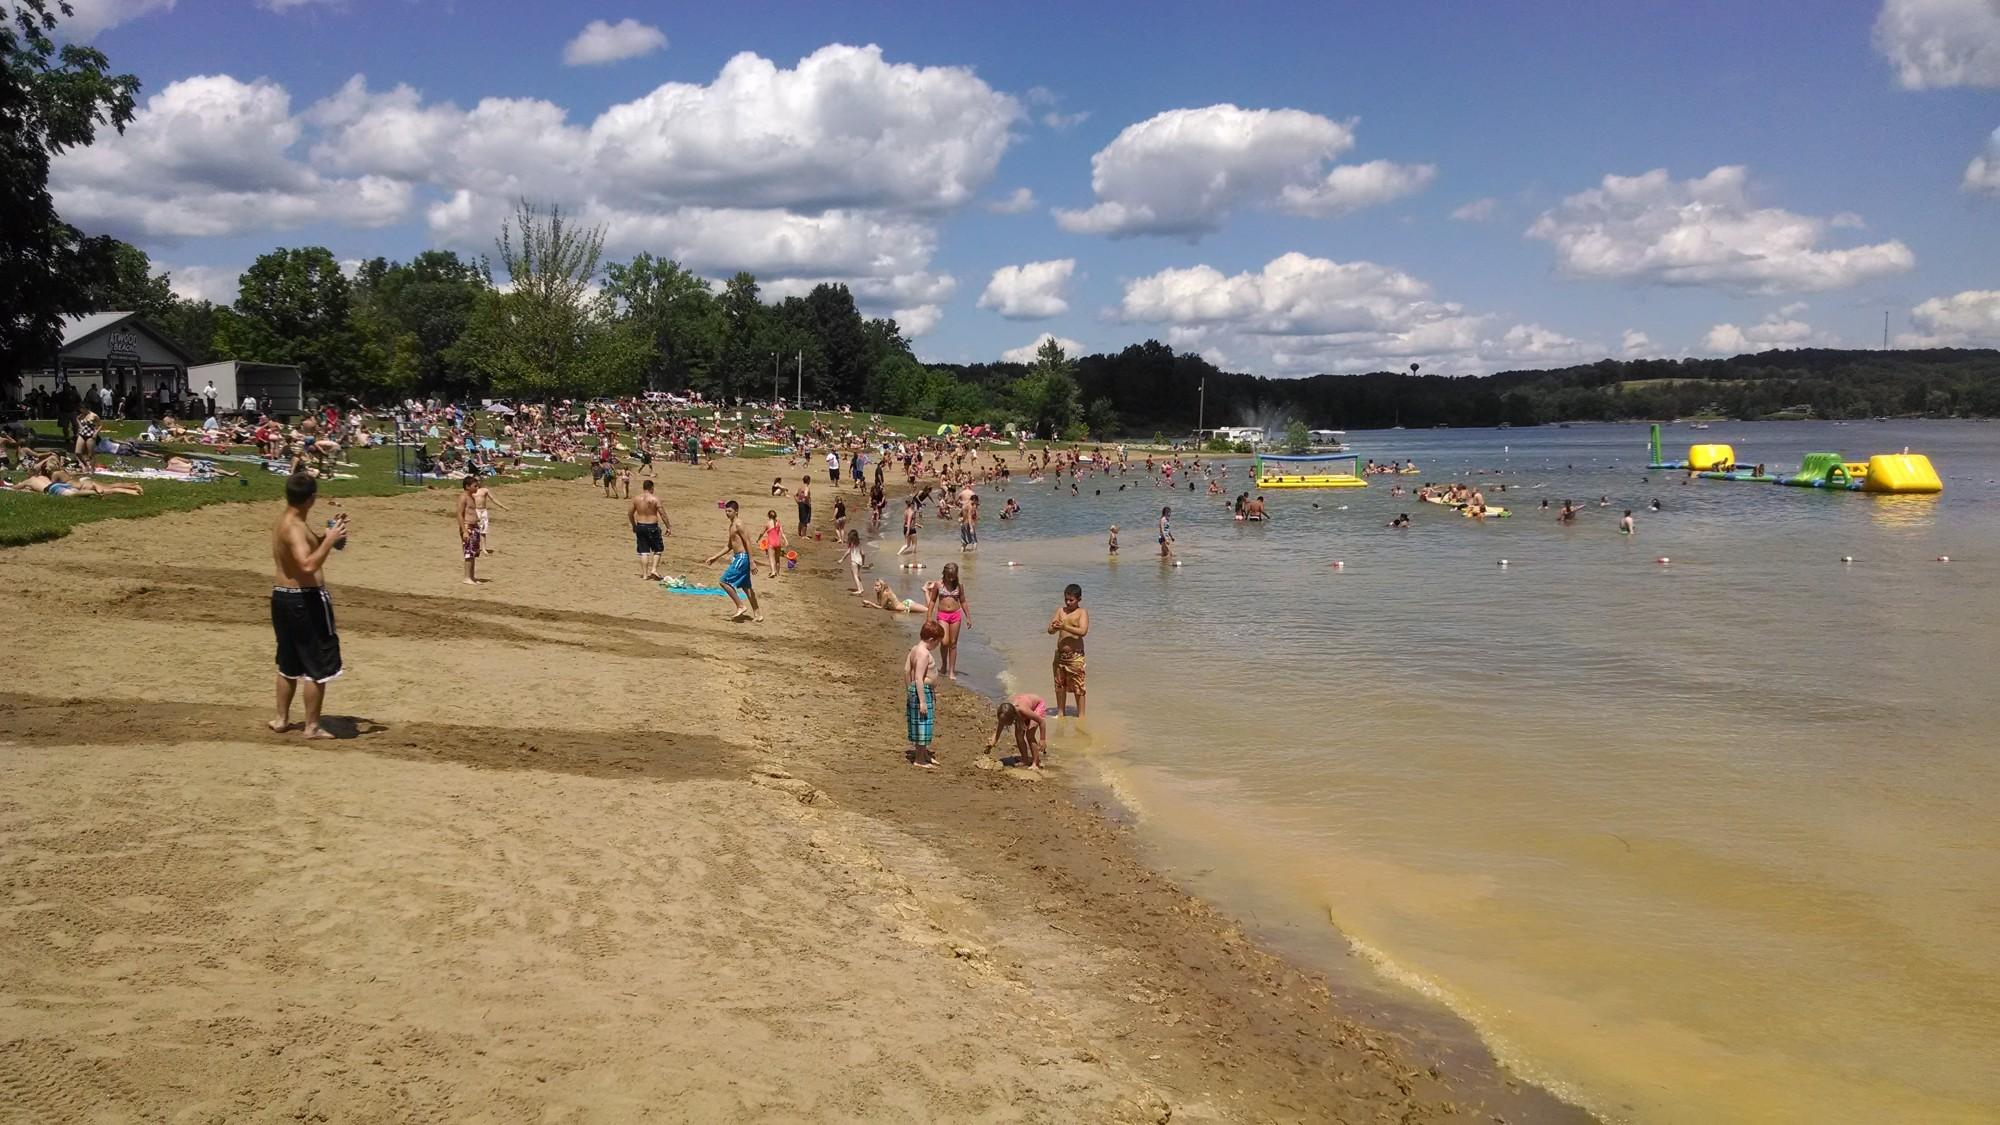 Swimming Beach - Atwood Lake Park, Ohio